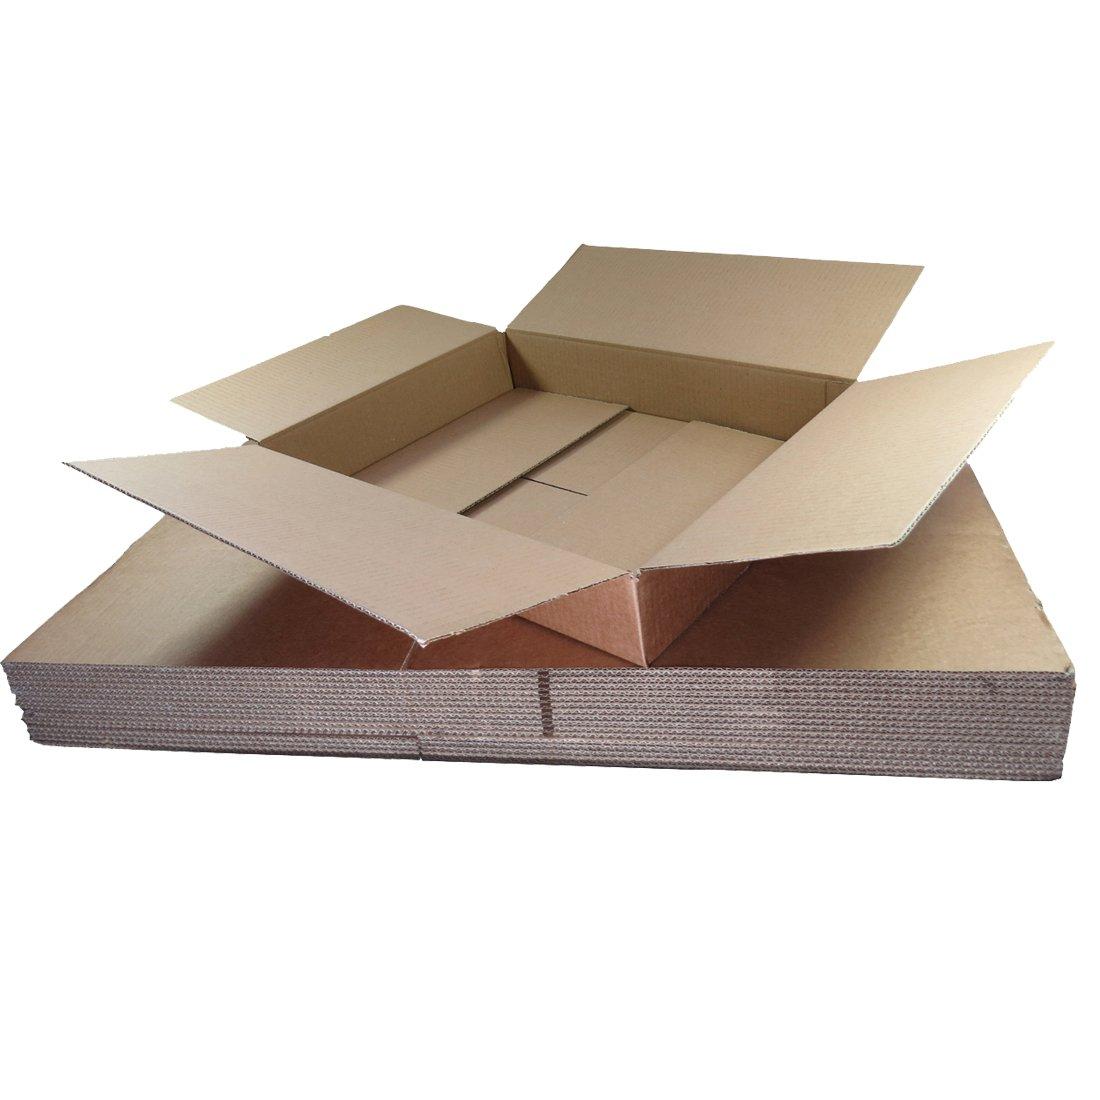 Triplast TPLBX10SINGL Scatole in cartone piccole per spedizioni, 449 x 349 x 159 mm TPLBX10SINGL17.5X13.5X5.7